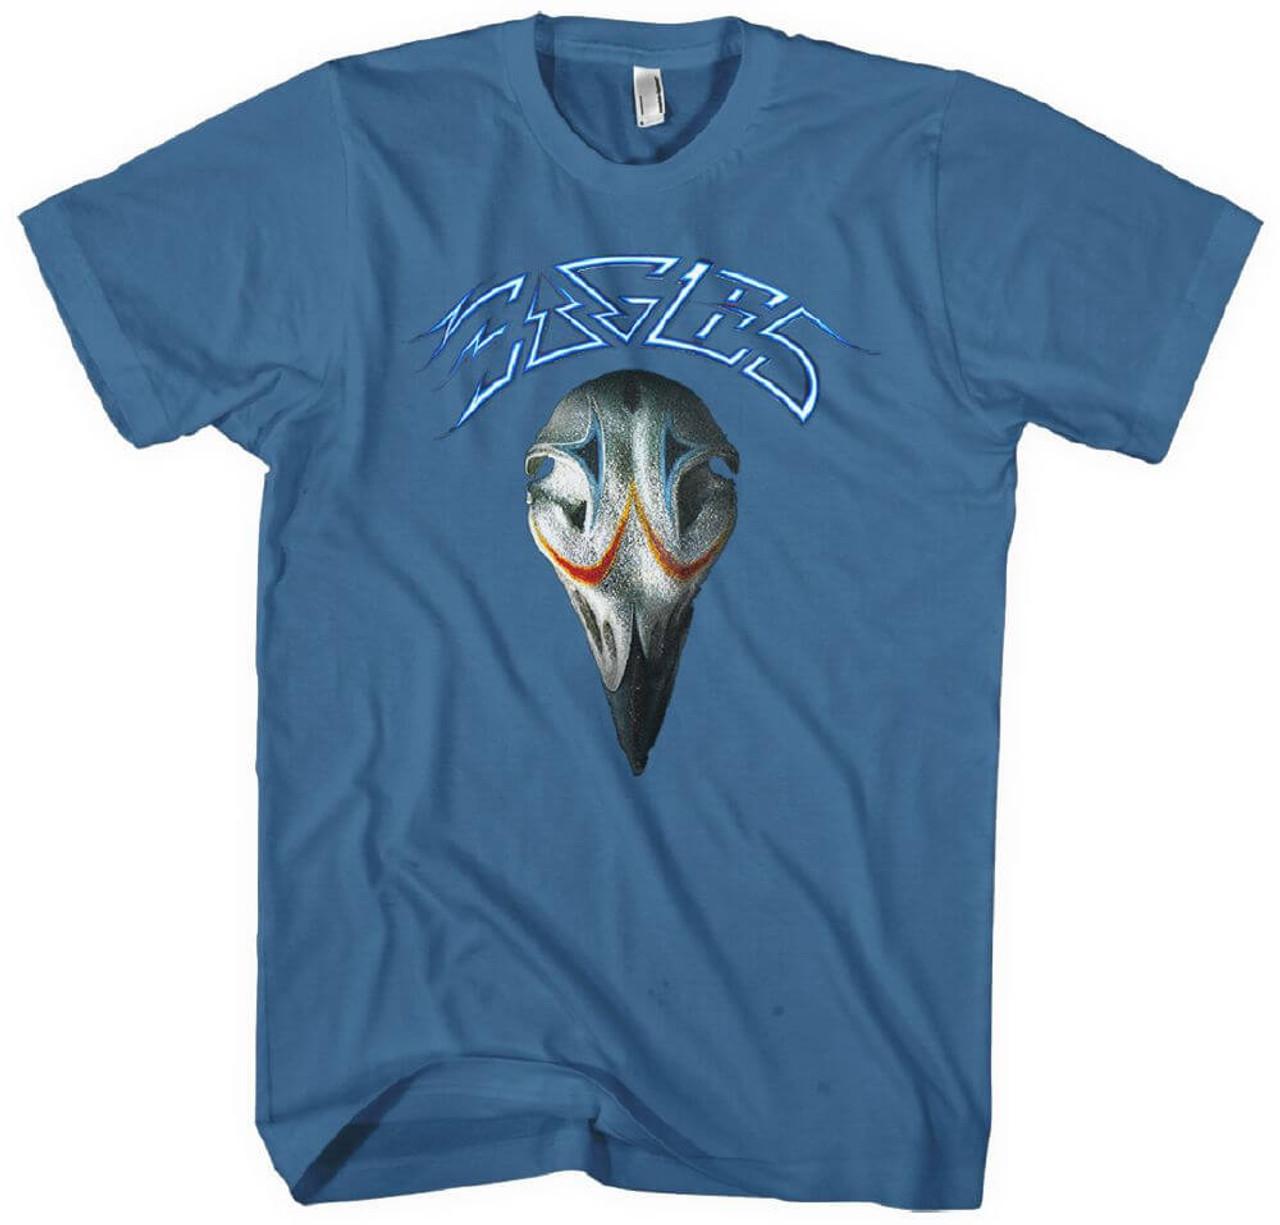 Eagles Greatest Hits Album Cover Artwork Men T-shirt